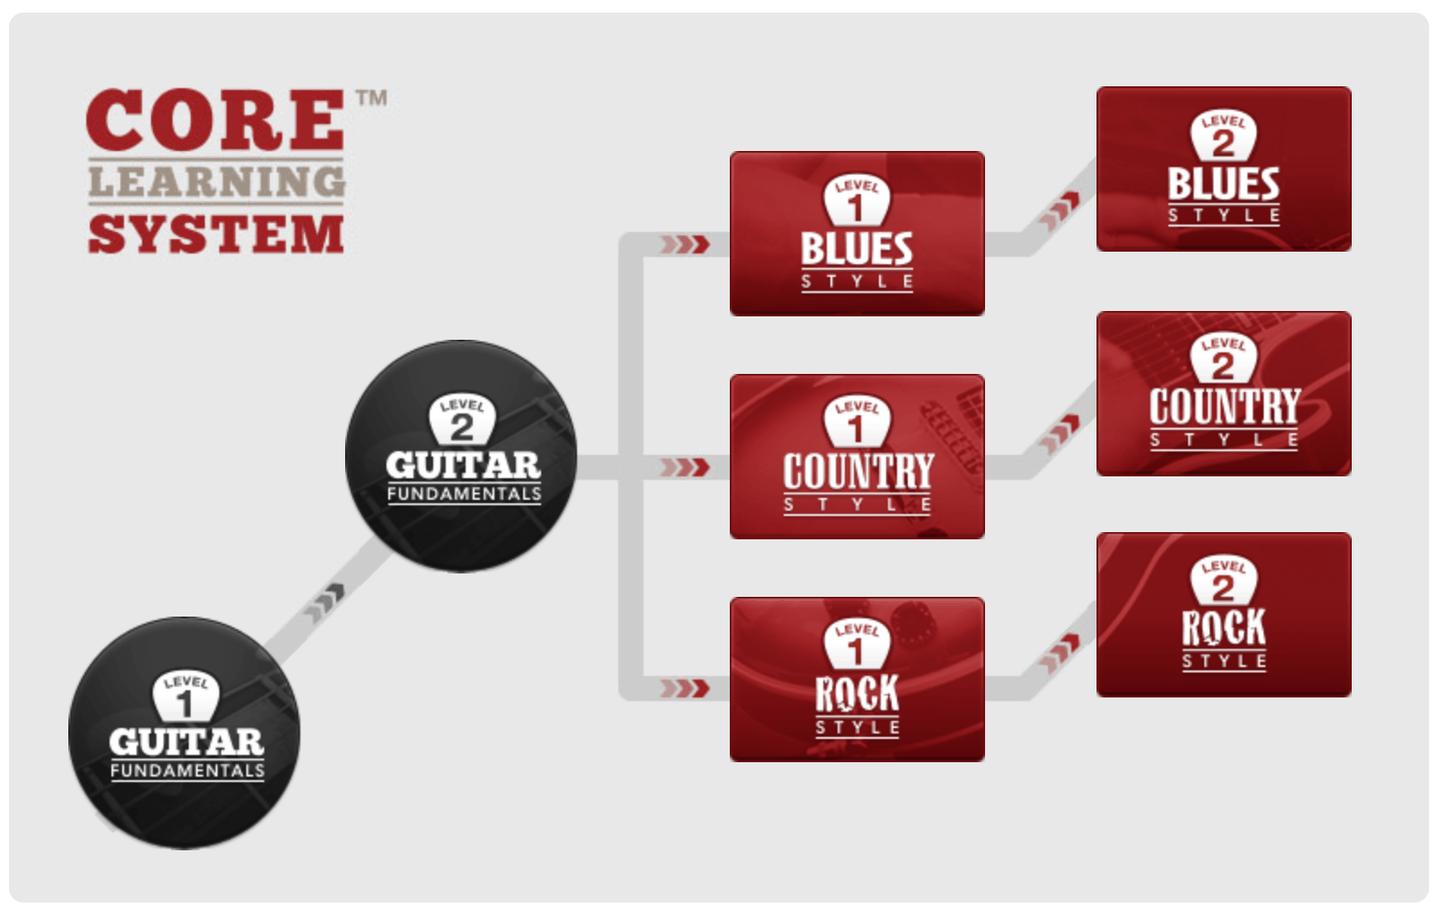 Advanced and Intermediate Guitar tricks